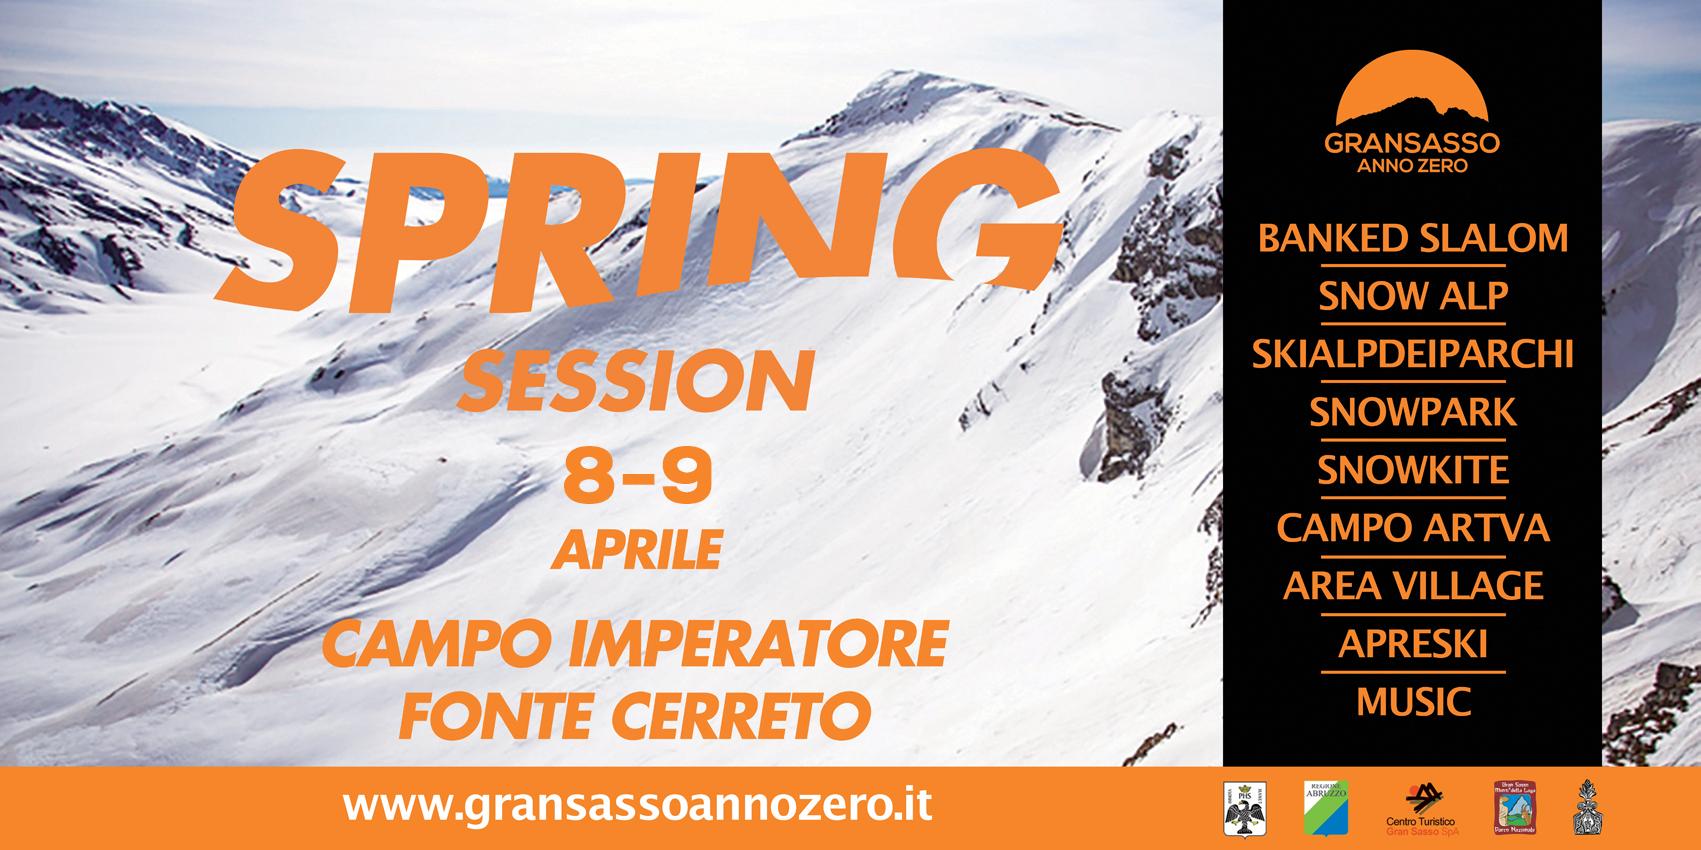 Spring Session – Gran Sasso d'Italia 08-09.04.2017